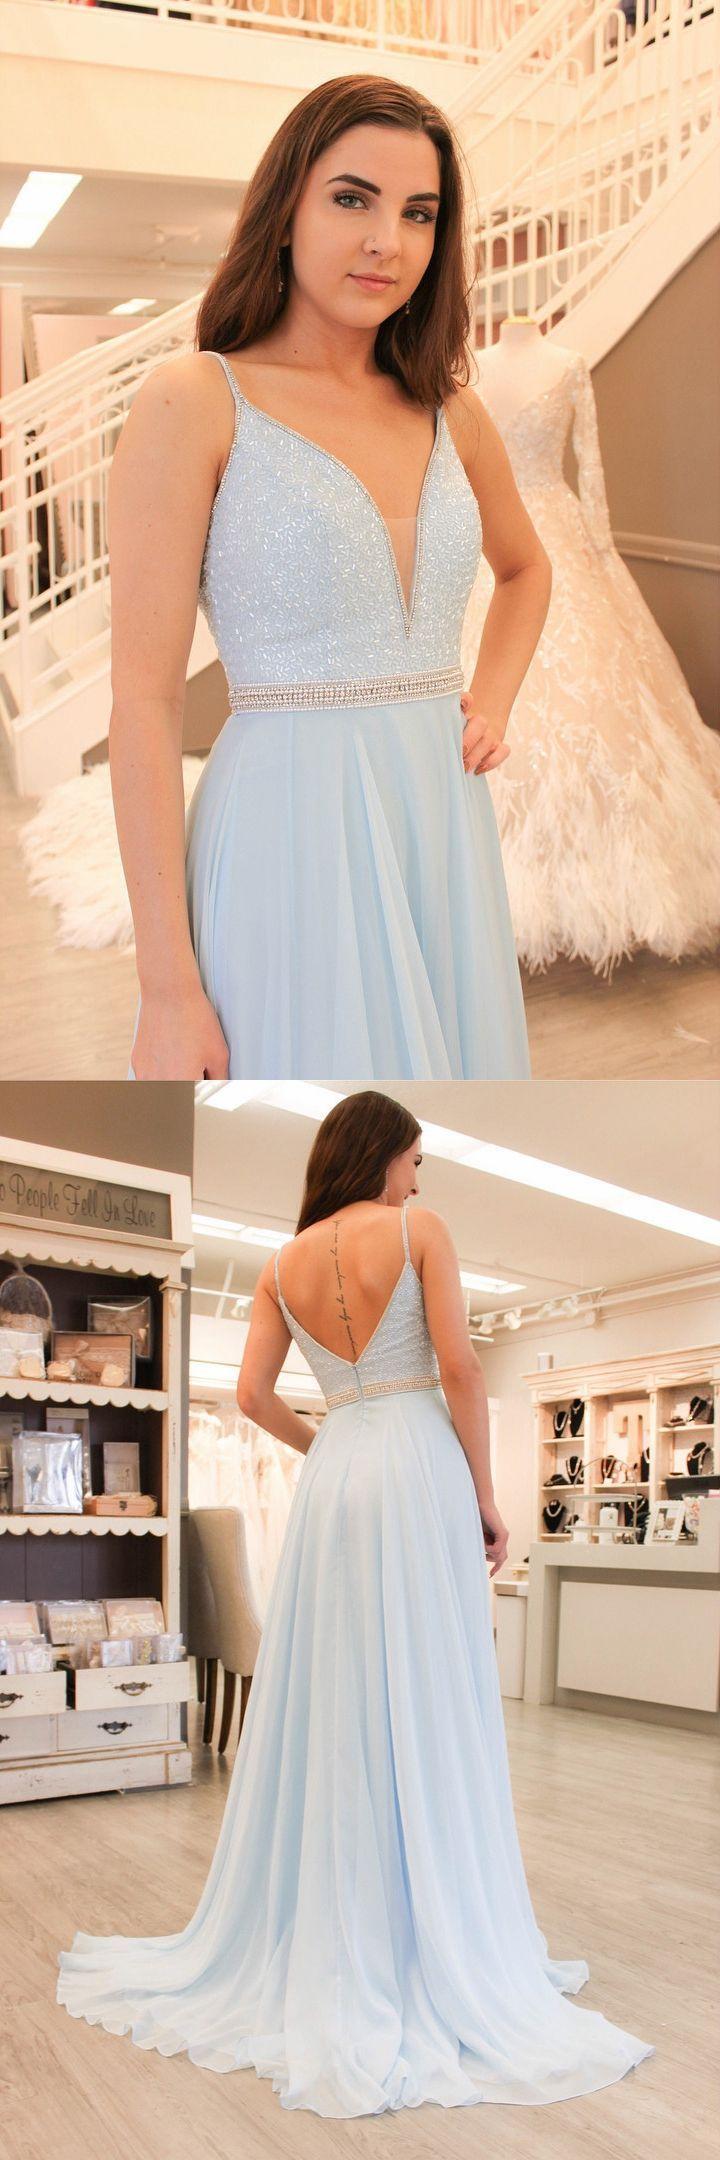 Fashion Prom Dresses 2018, Prom Dress, Sweet 16 Dress, Evening Dresses, Pageant Dresses, Graduation Party Dresses, Banquet Gown #Graduationdresses #promdresses